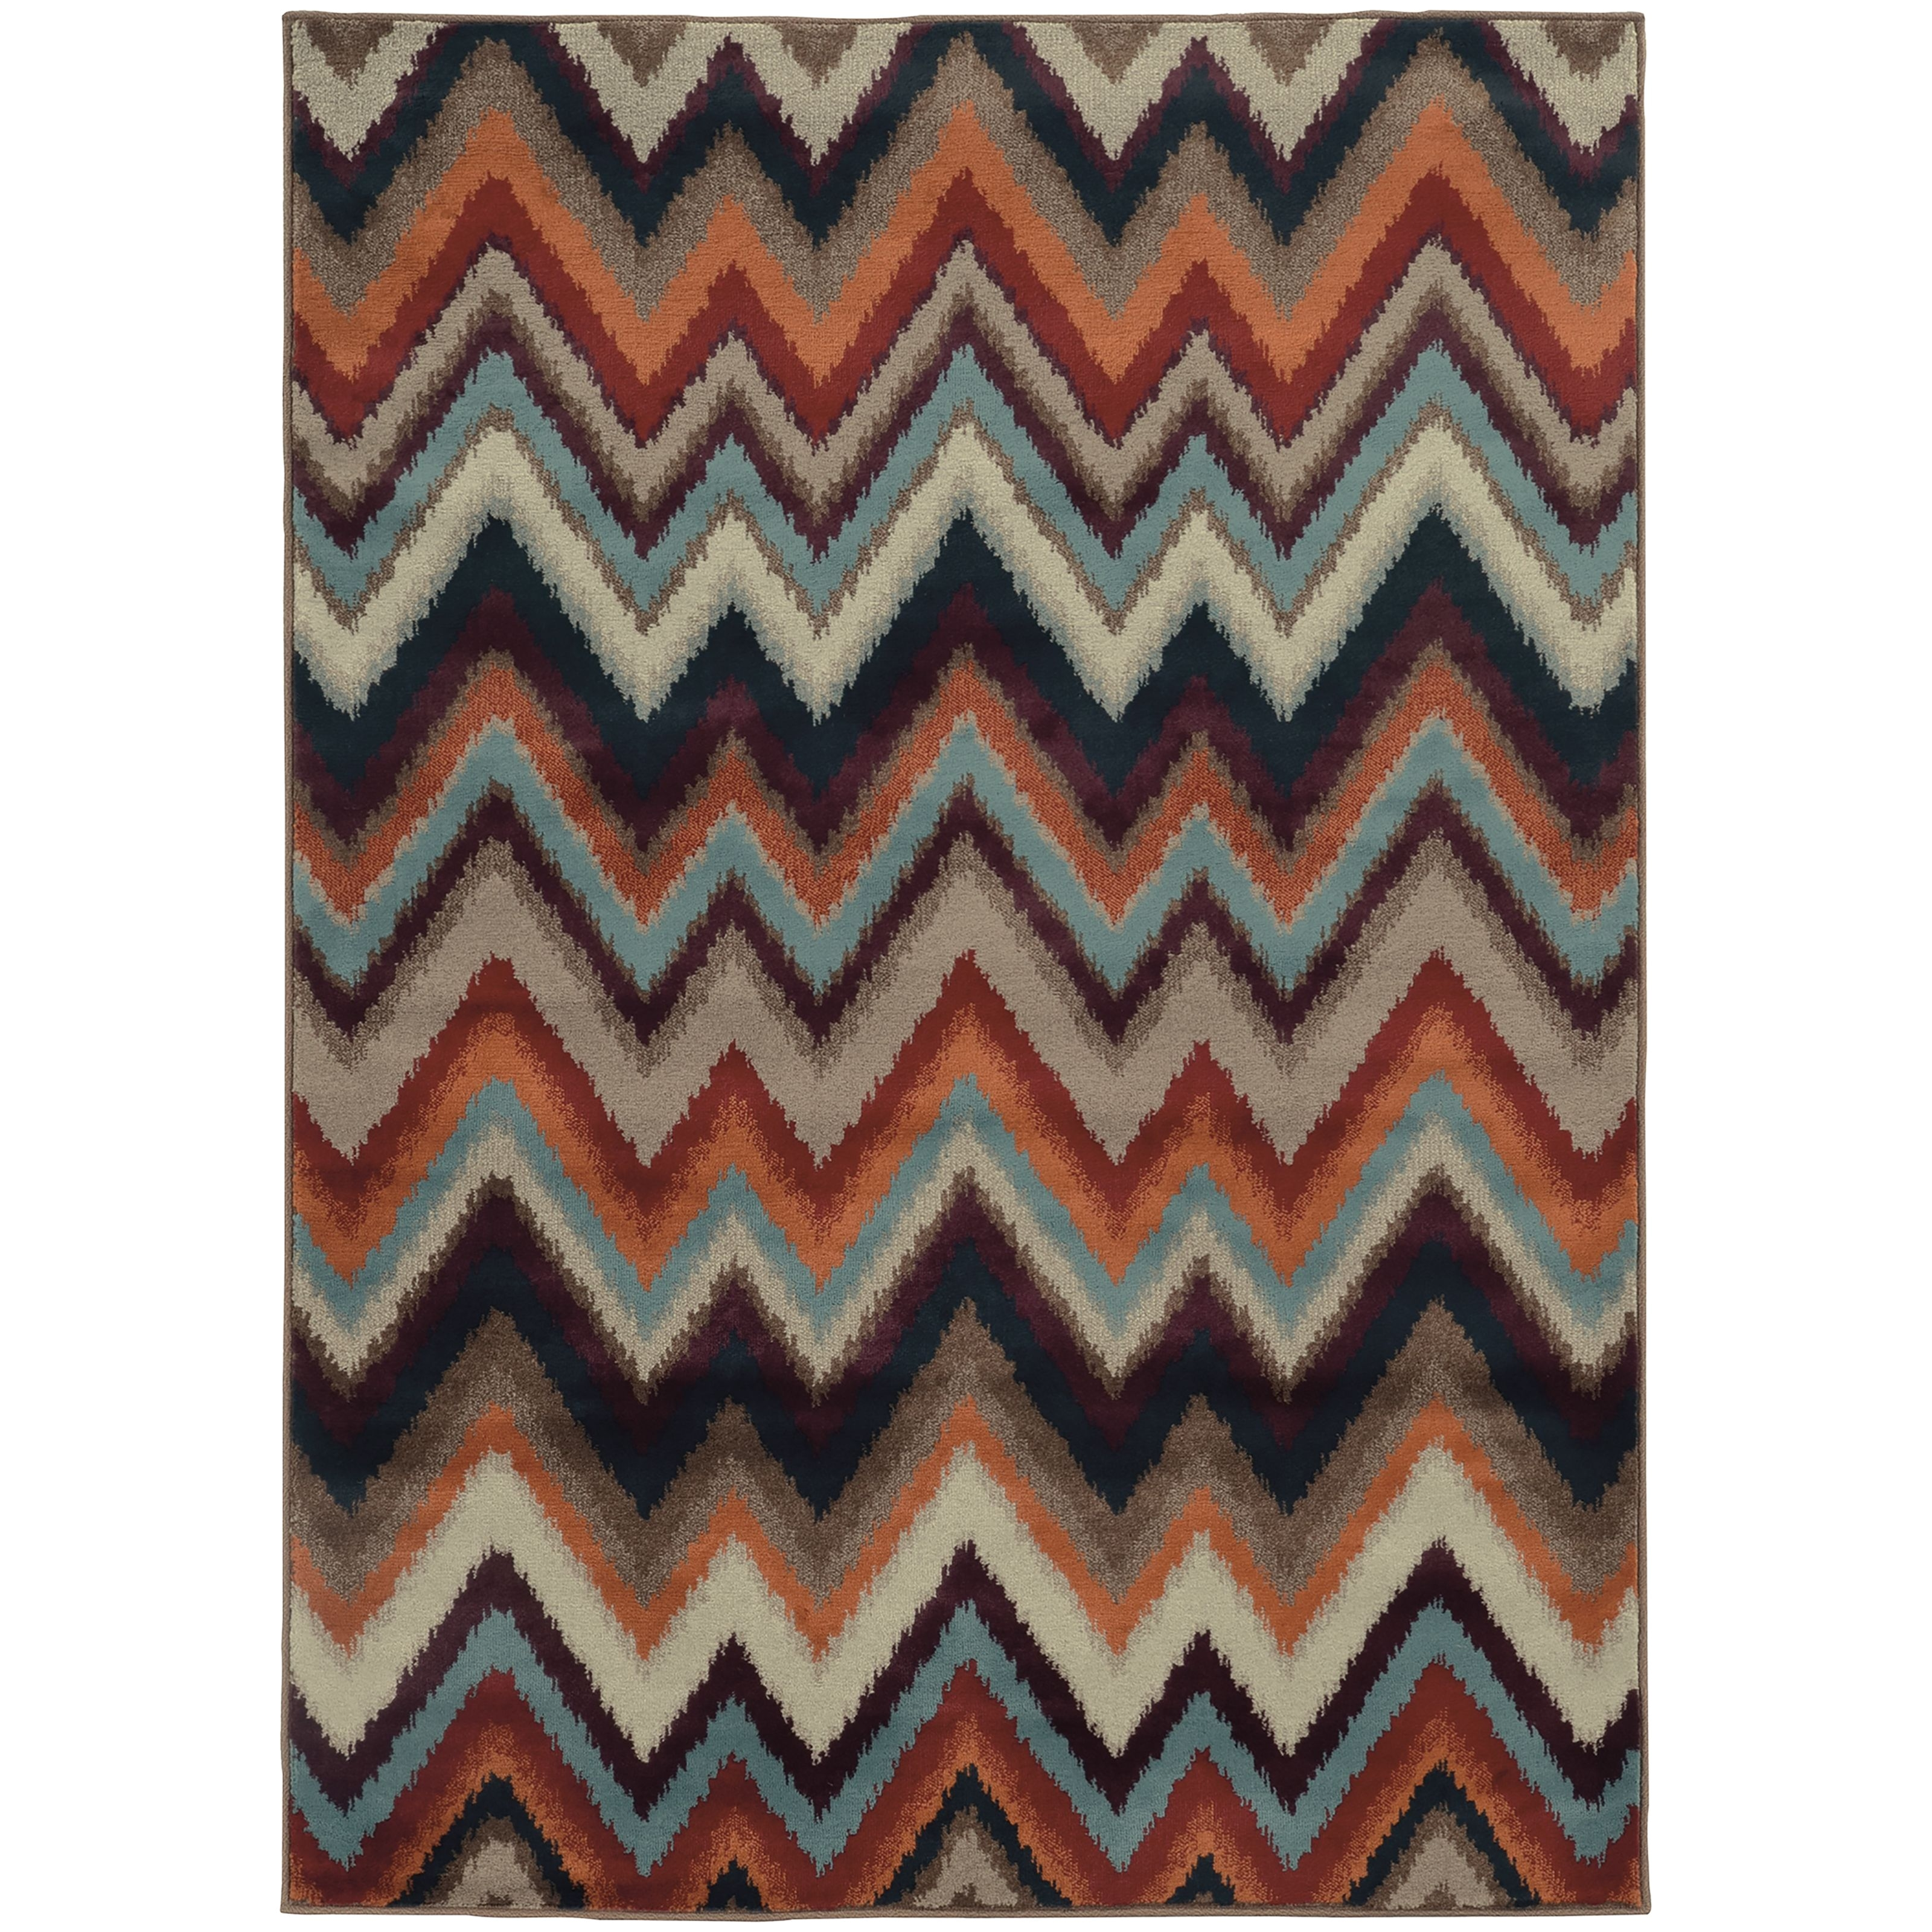 style haven chevron ikat multi stone rug 3 10x5 5